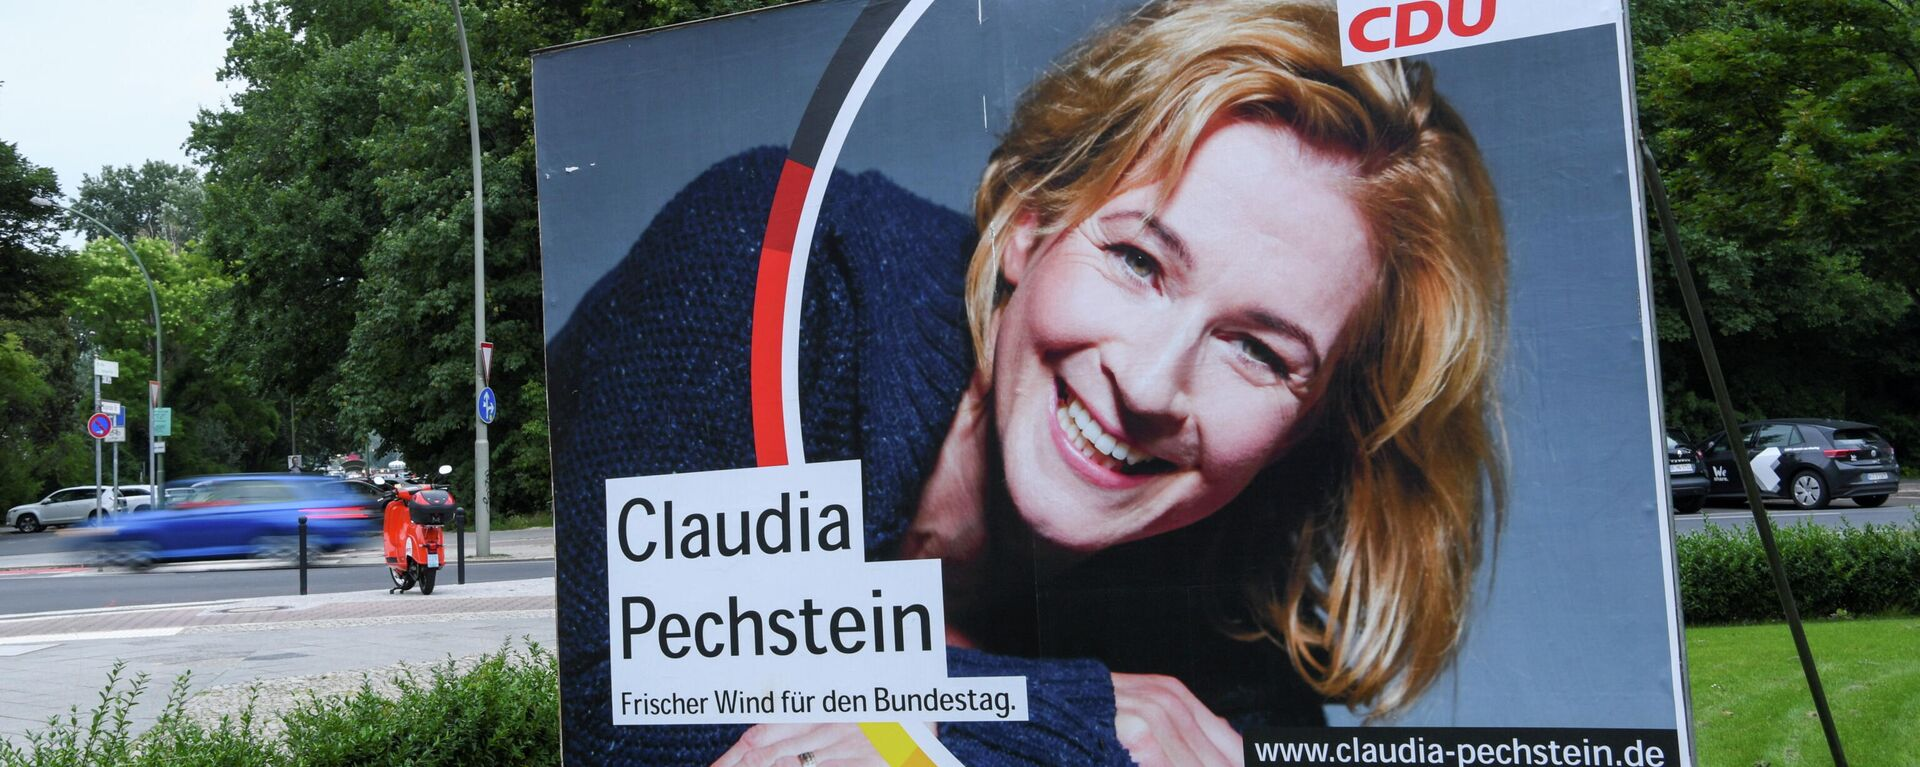 Wahlplakat mit Claudia Pechstein - SNA, 1920, 25.08.2021